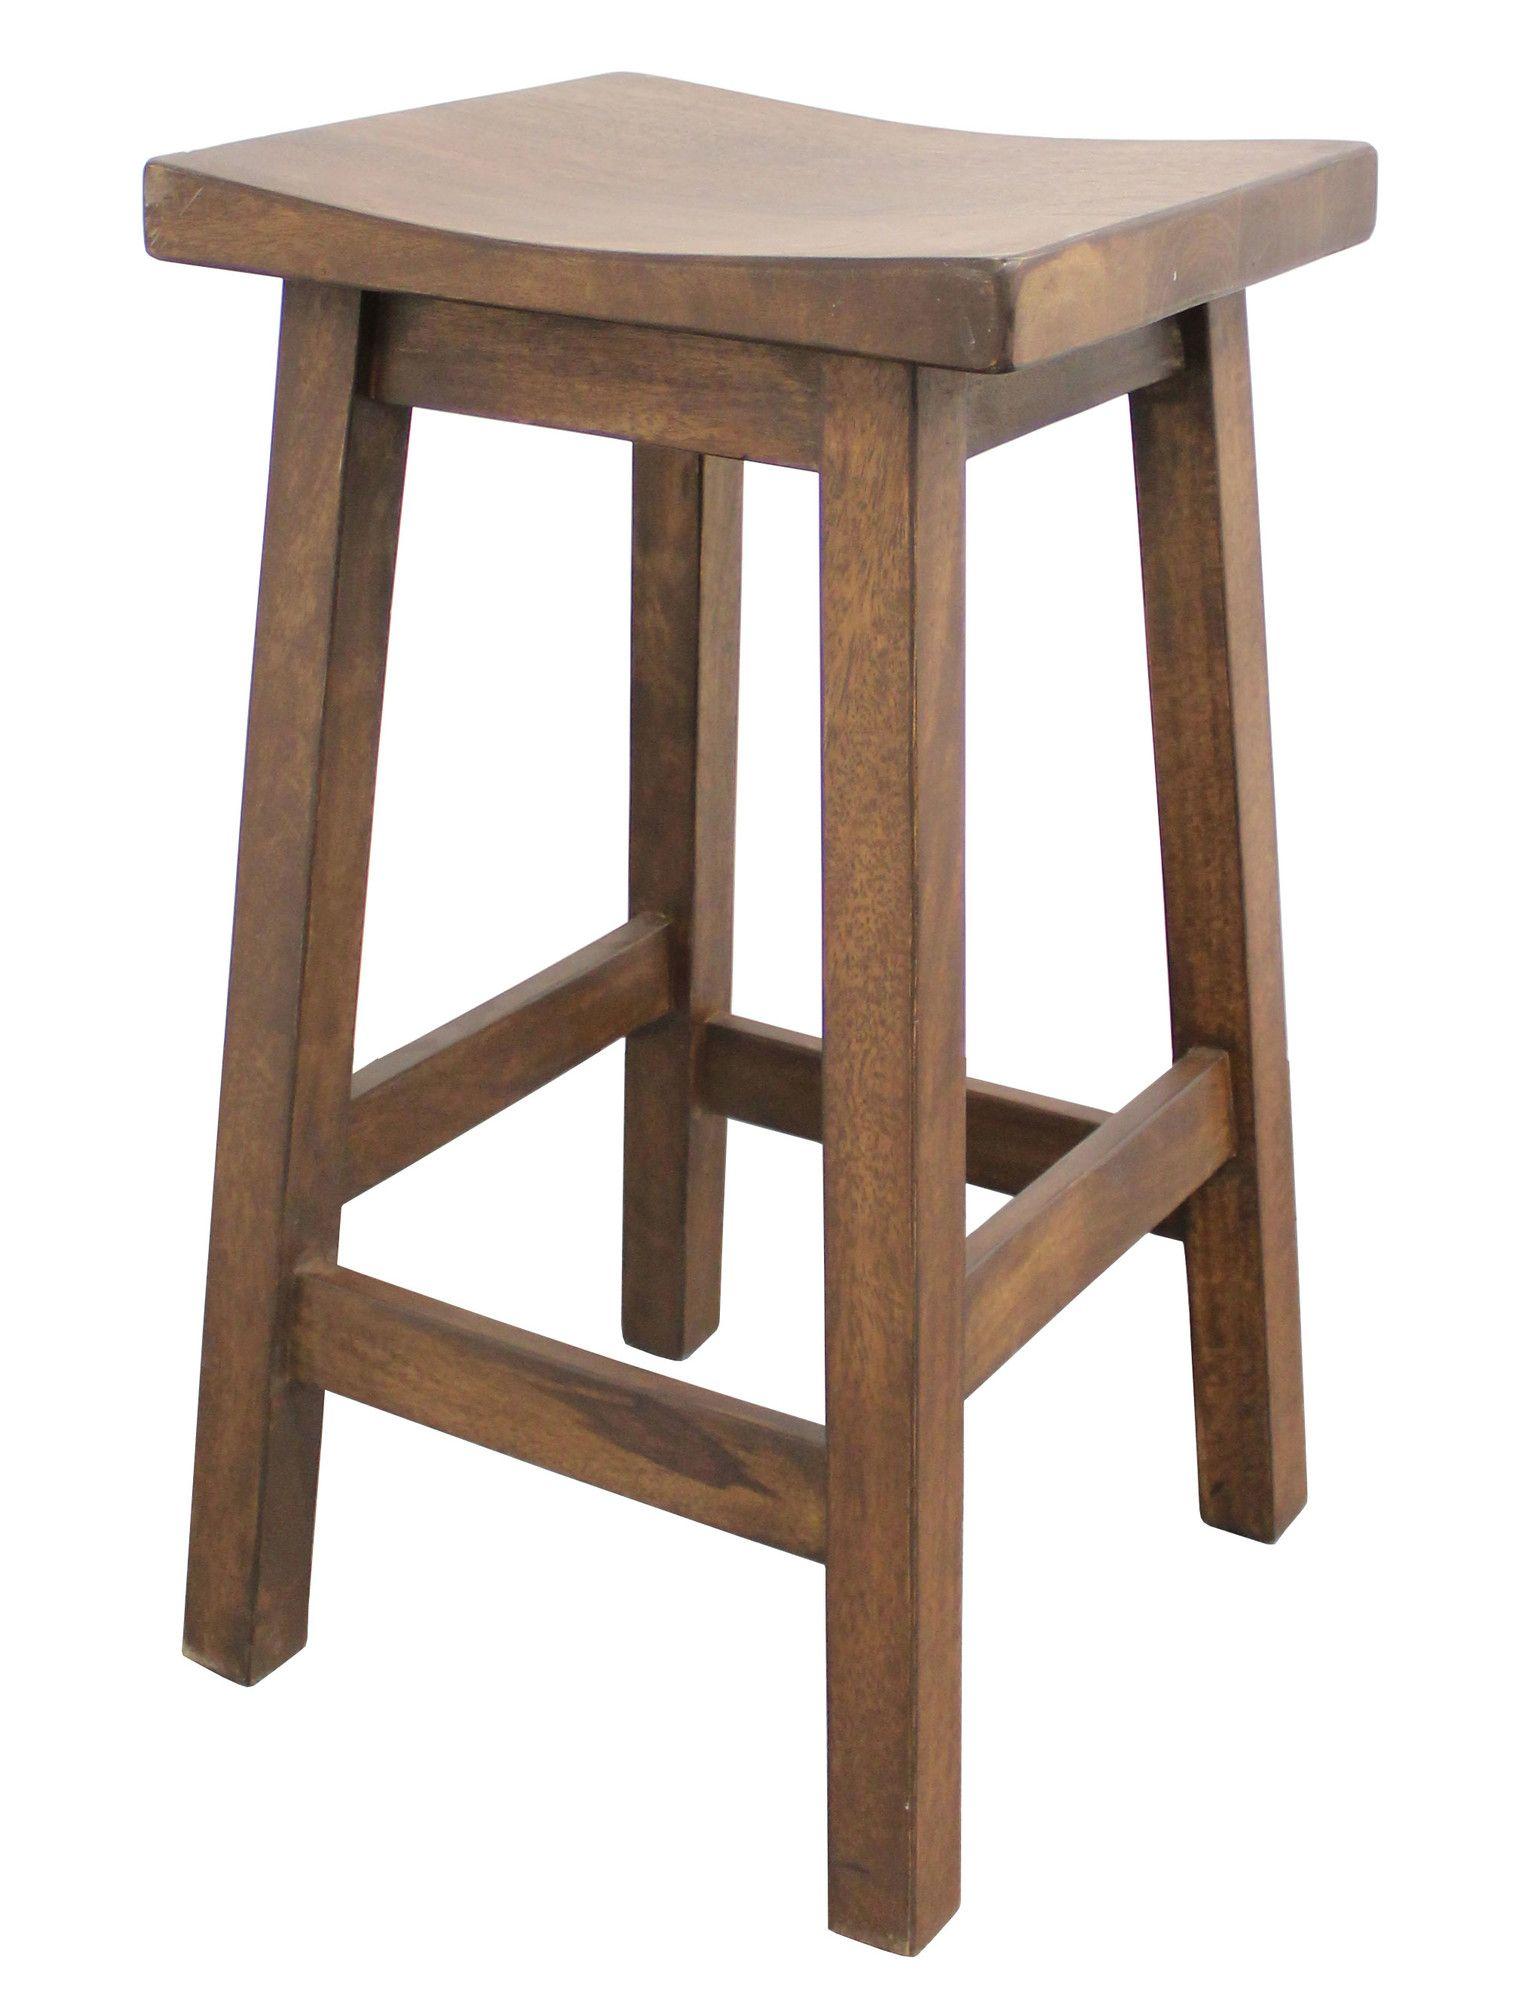 wayfair kitchen stools baseboards cafe del mar wooden barstool banco de madera pinterest bar the patriot stool australia